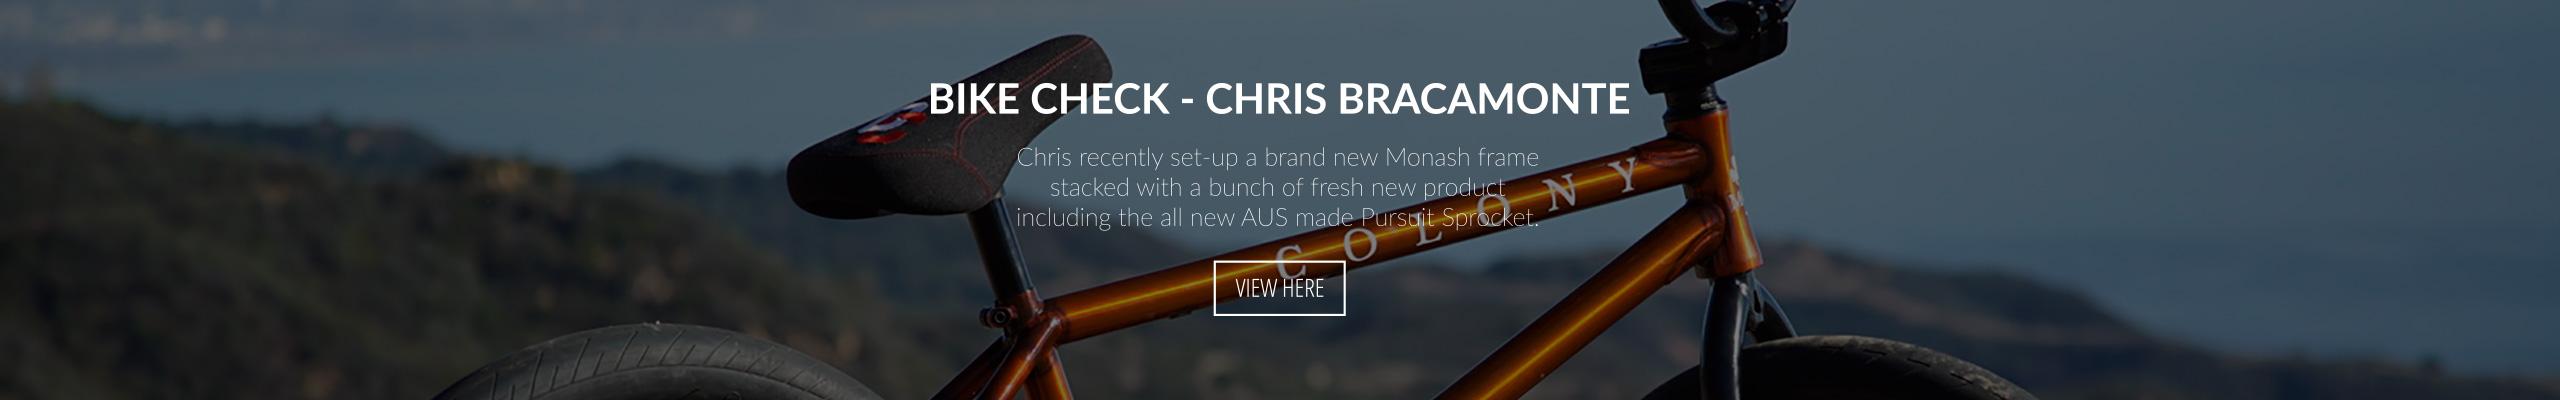 Bracamonte bike check